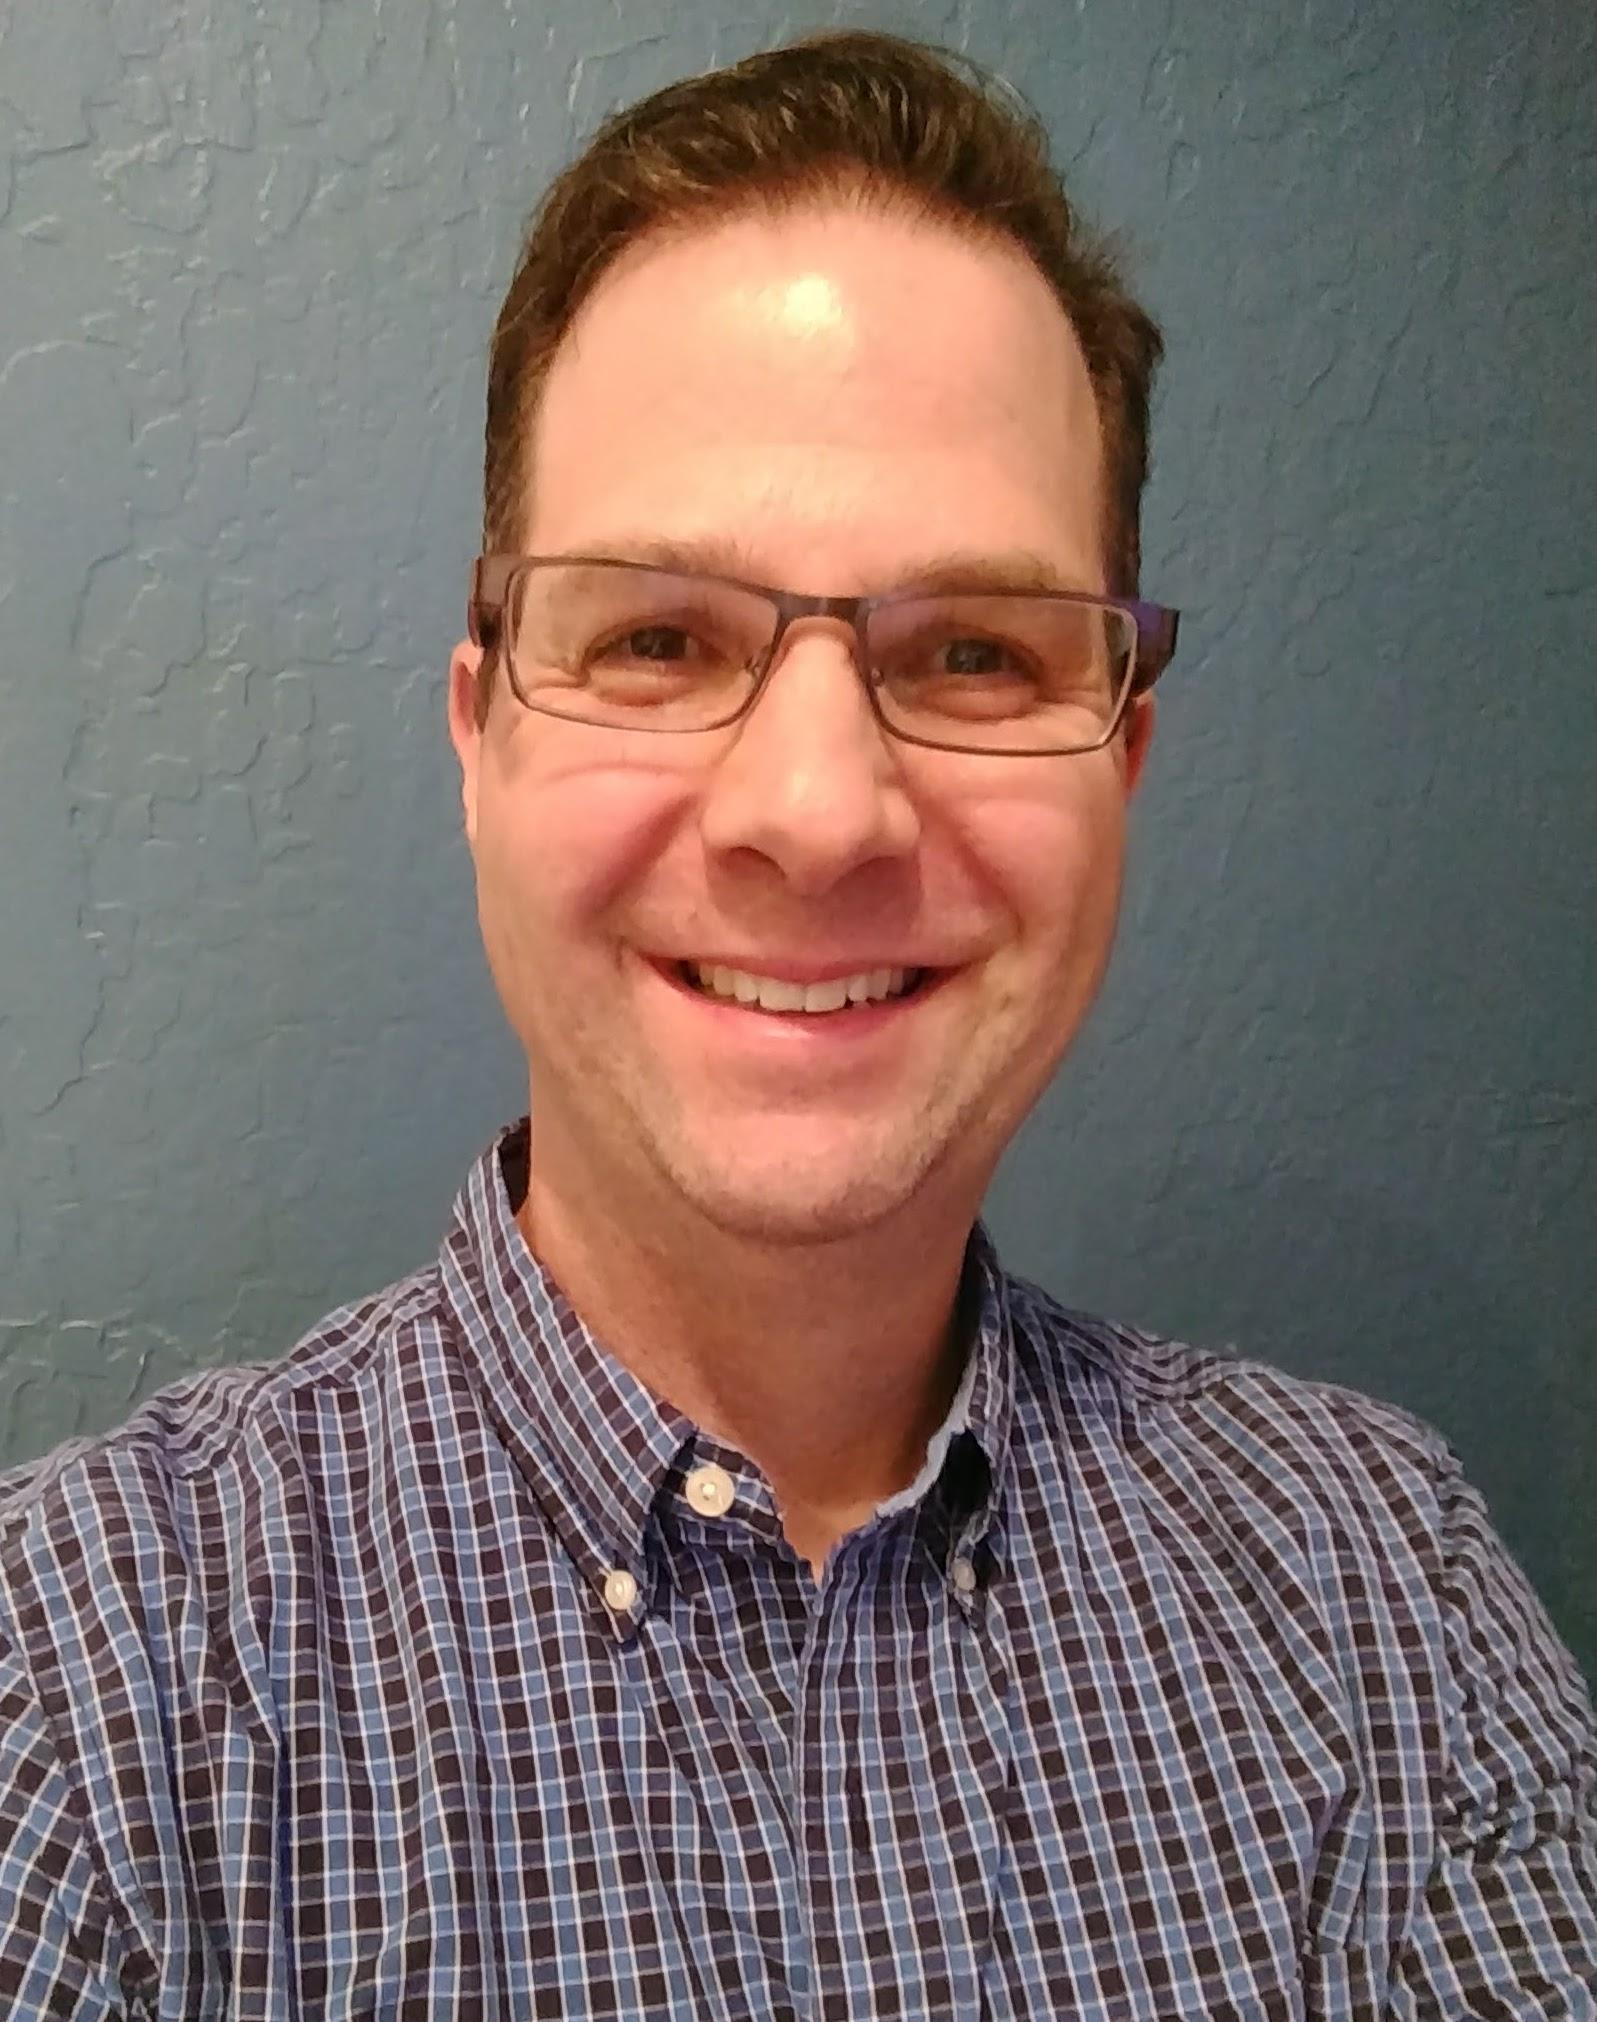 Community XR Partner - Matt Schuster, Executive Director, Public Media Network, Kalamazoo, MI